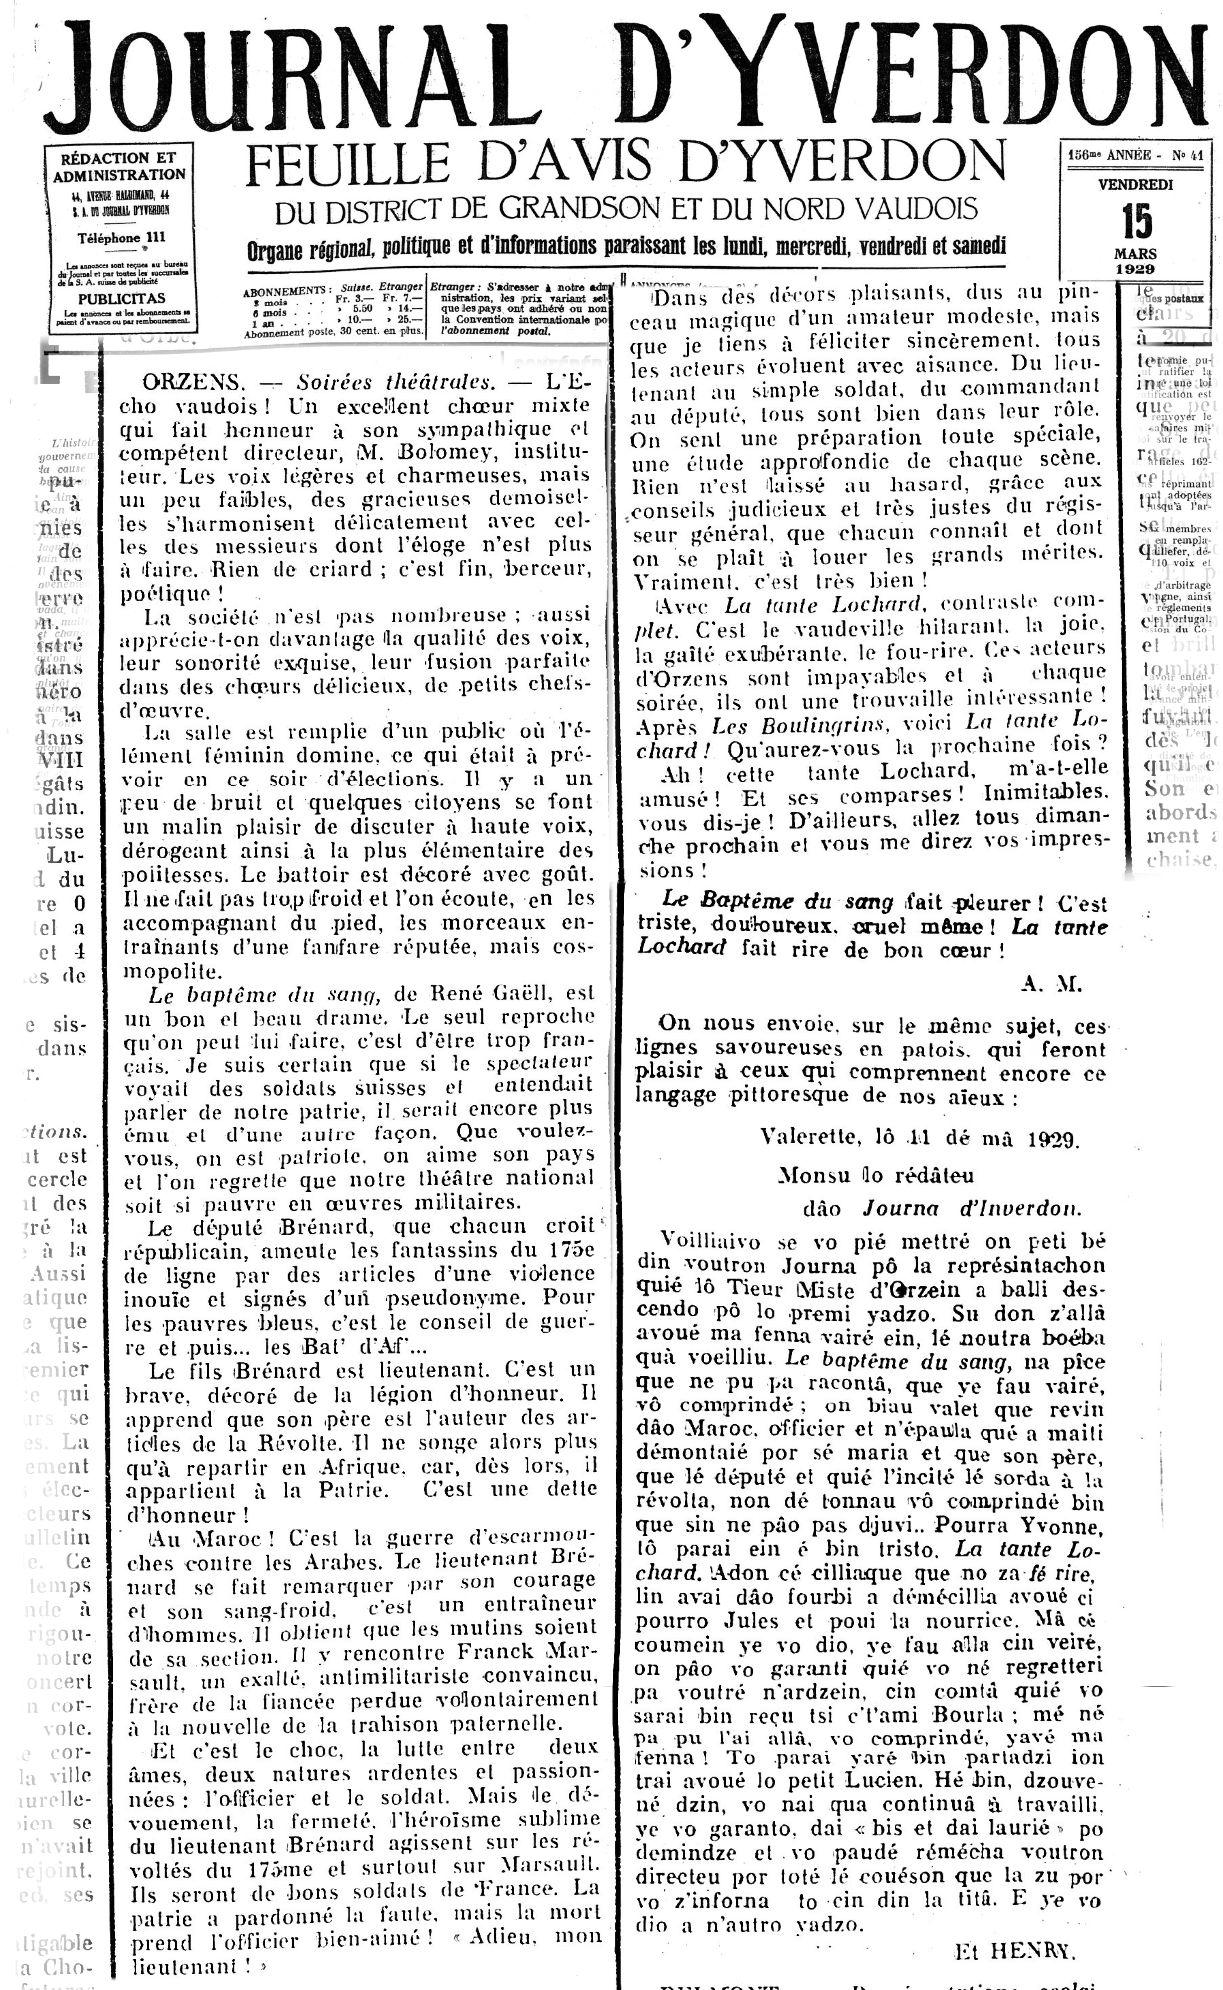 Journal d Yverdon 15-02-1929 ORZENS Le bateme du sang